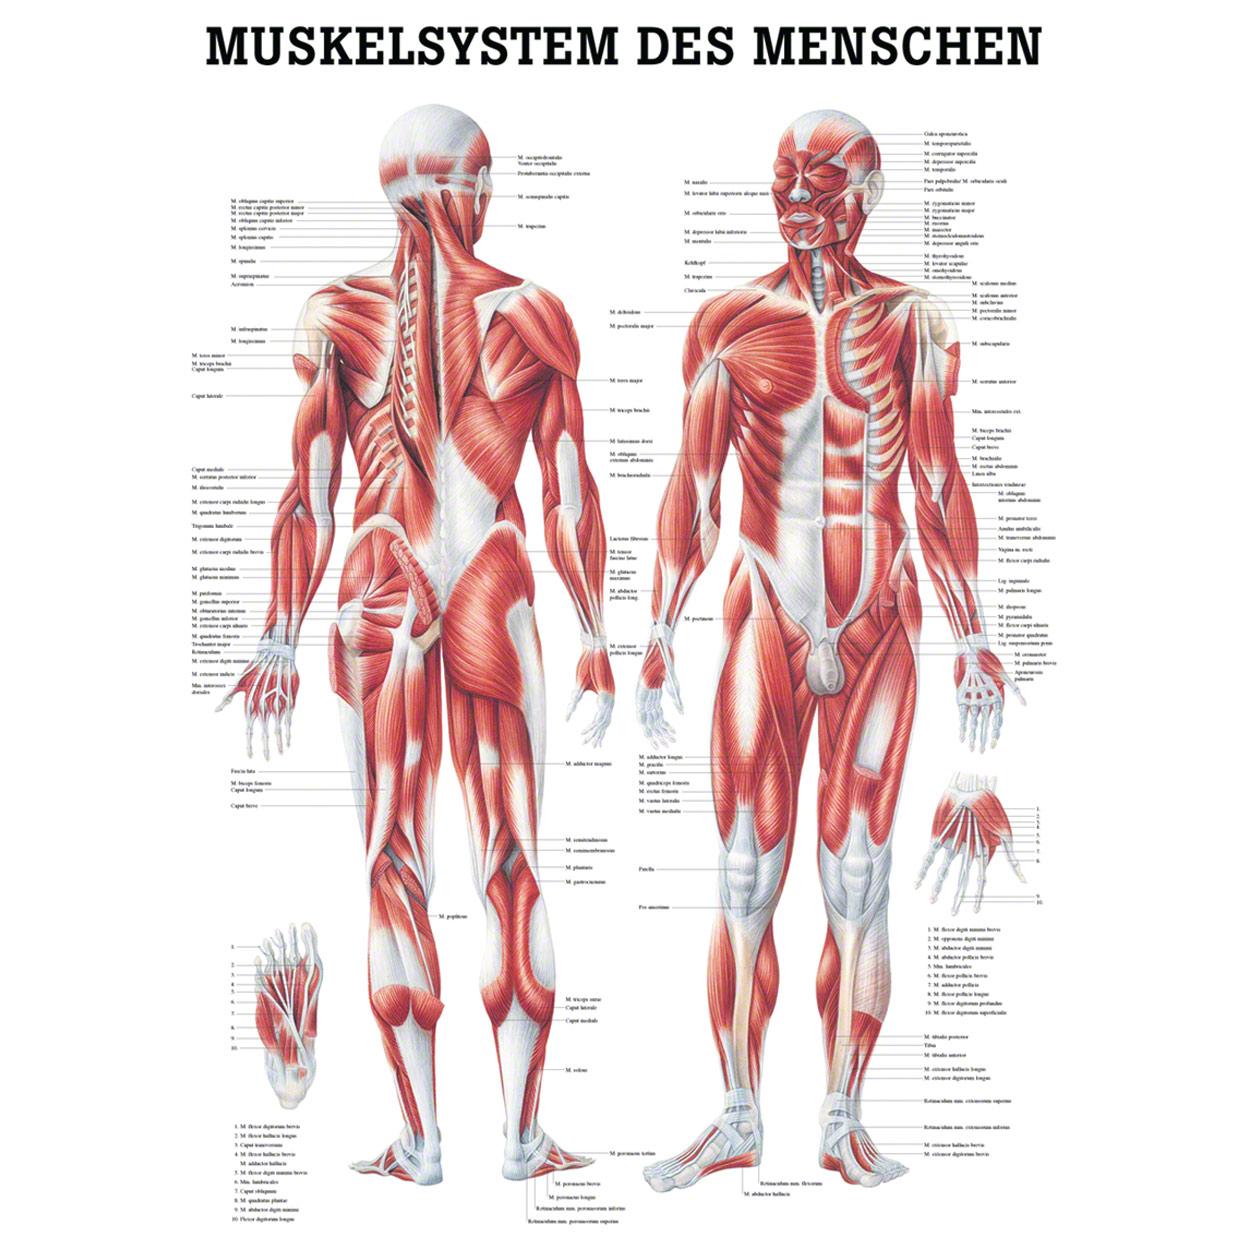 Muskelsystem Poster Anatomie 70x50 cm medizinische Lehrmittel | eBay